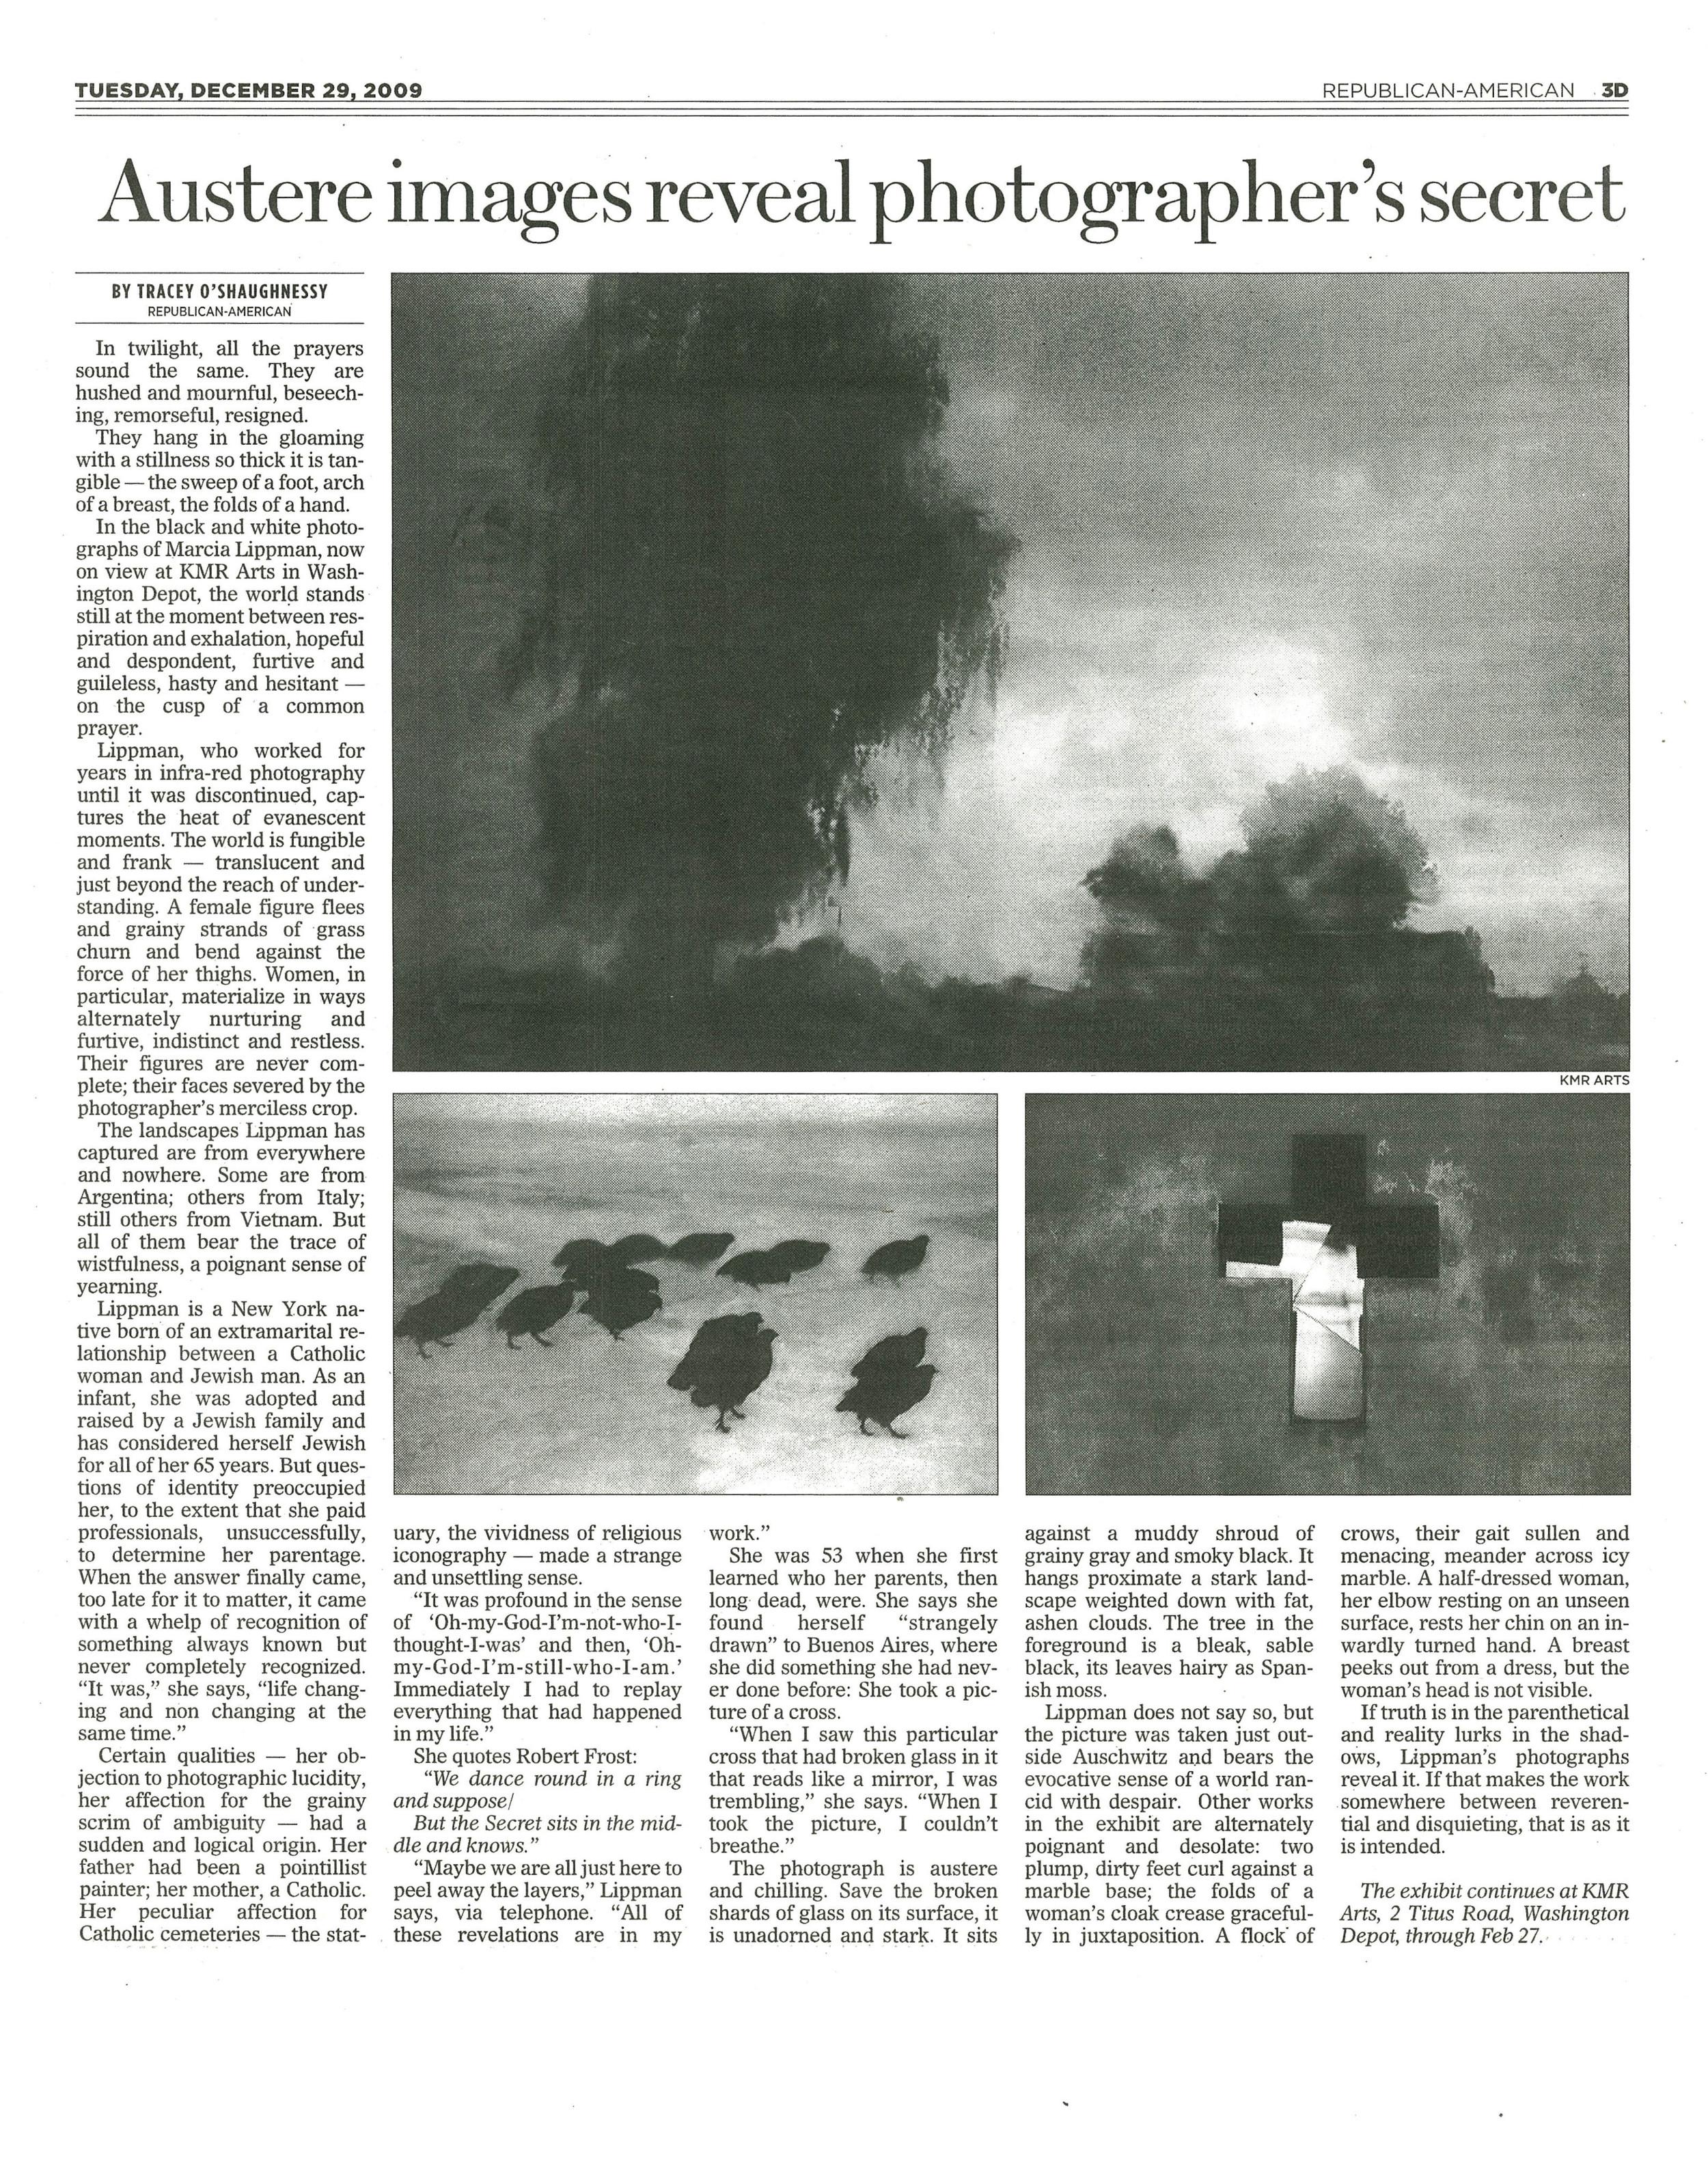 Austere Images Reveal Photographers' Secret. December 29, 2009. Republican American.jpg